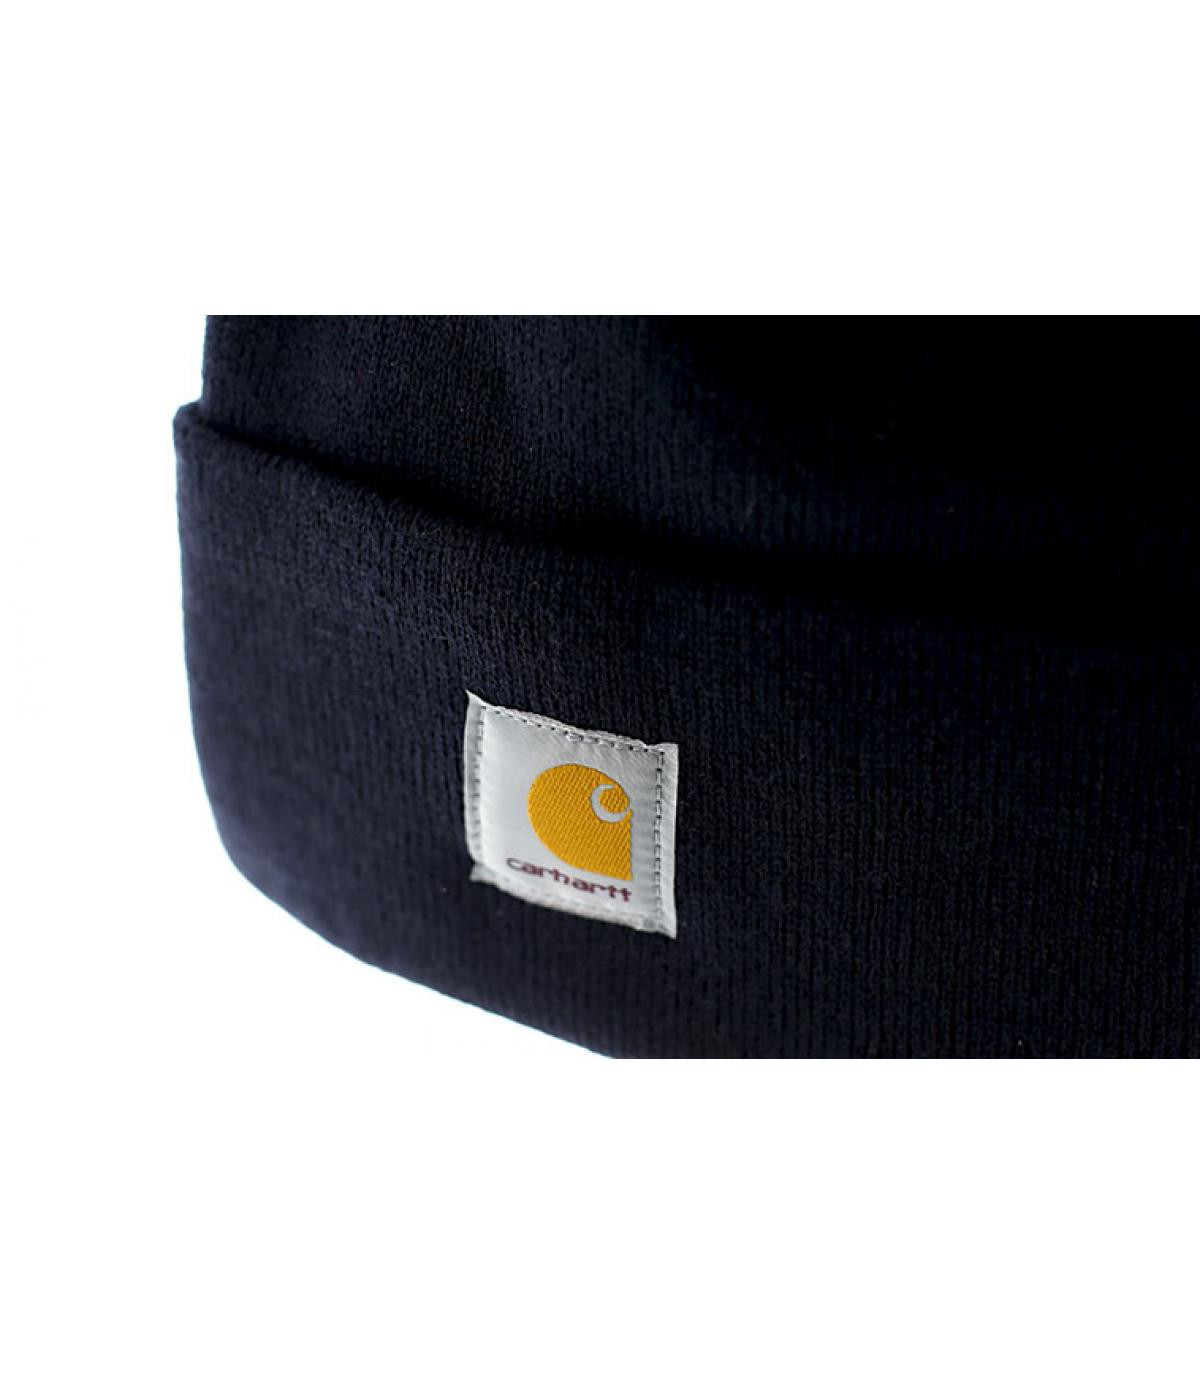 Dettagli Berretto Watch navy - image 3